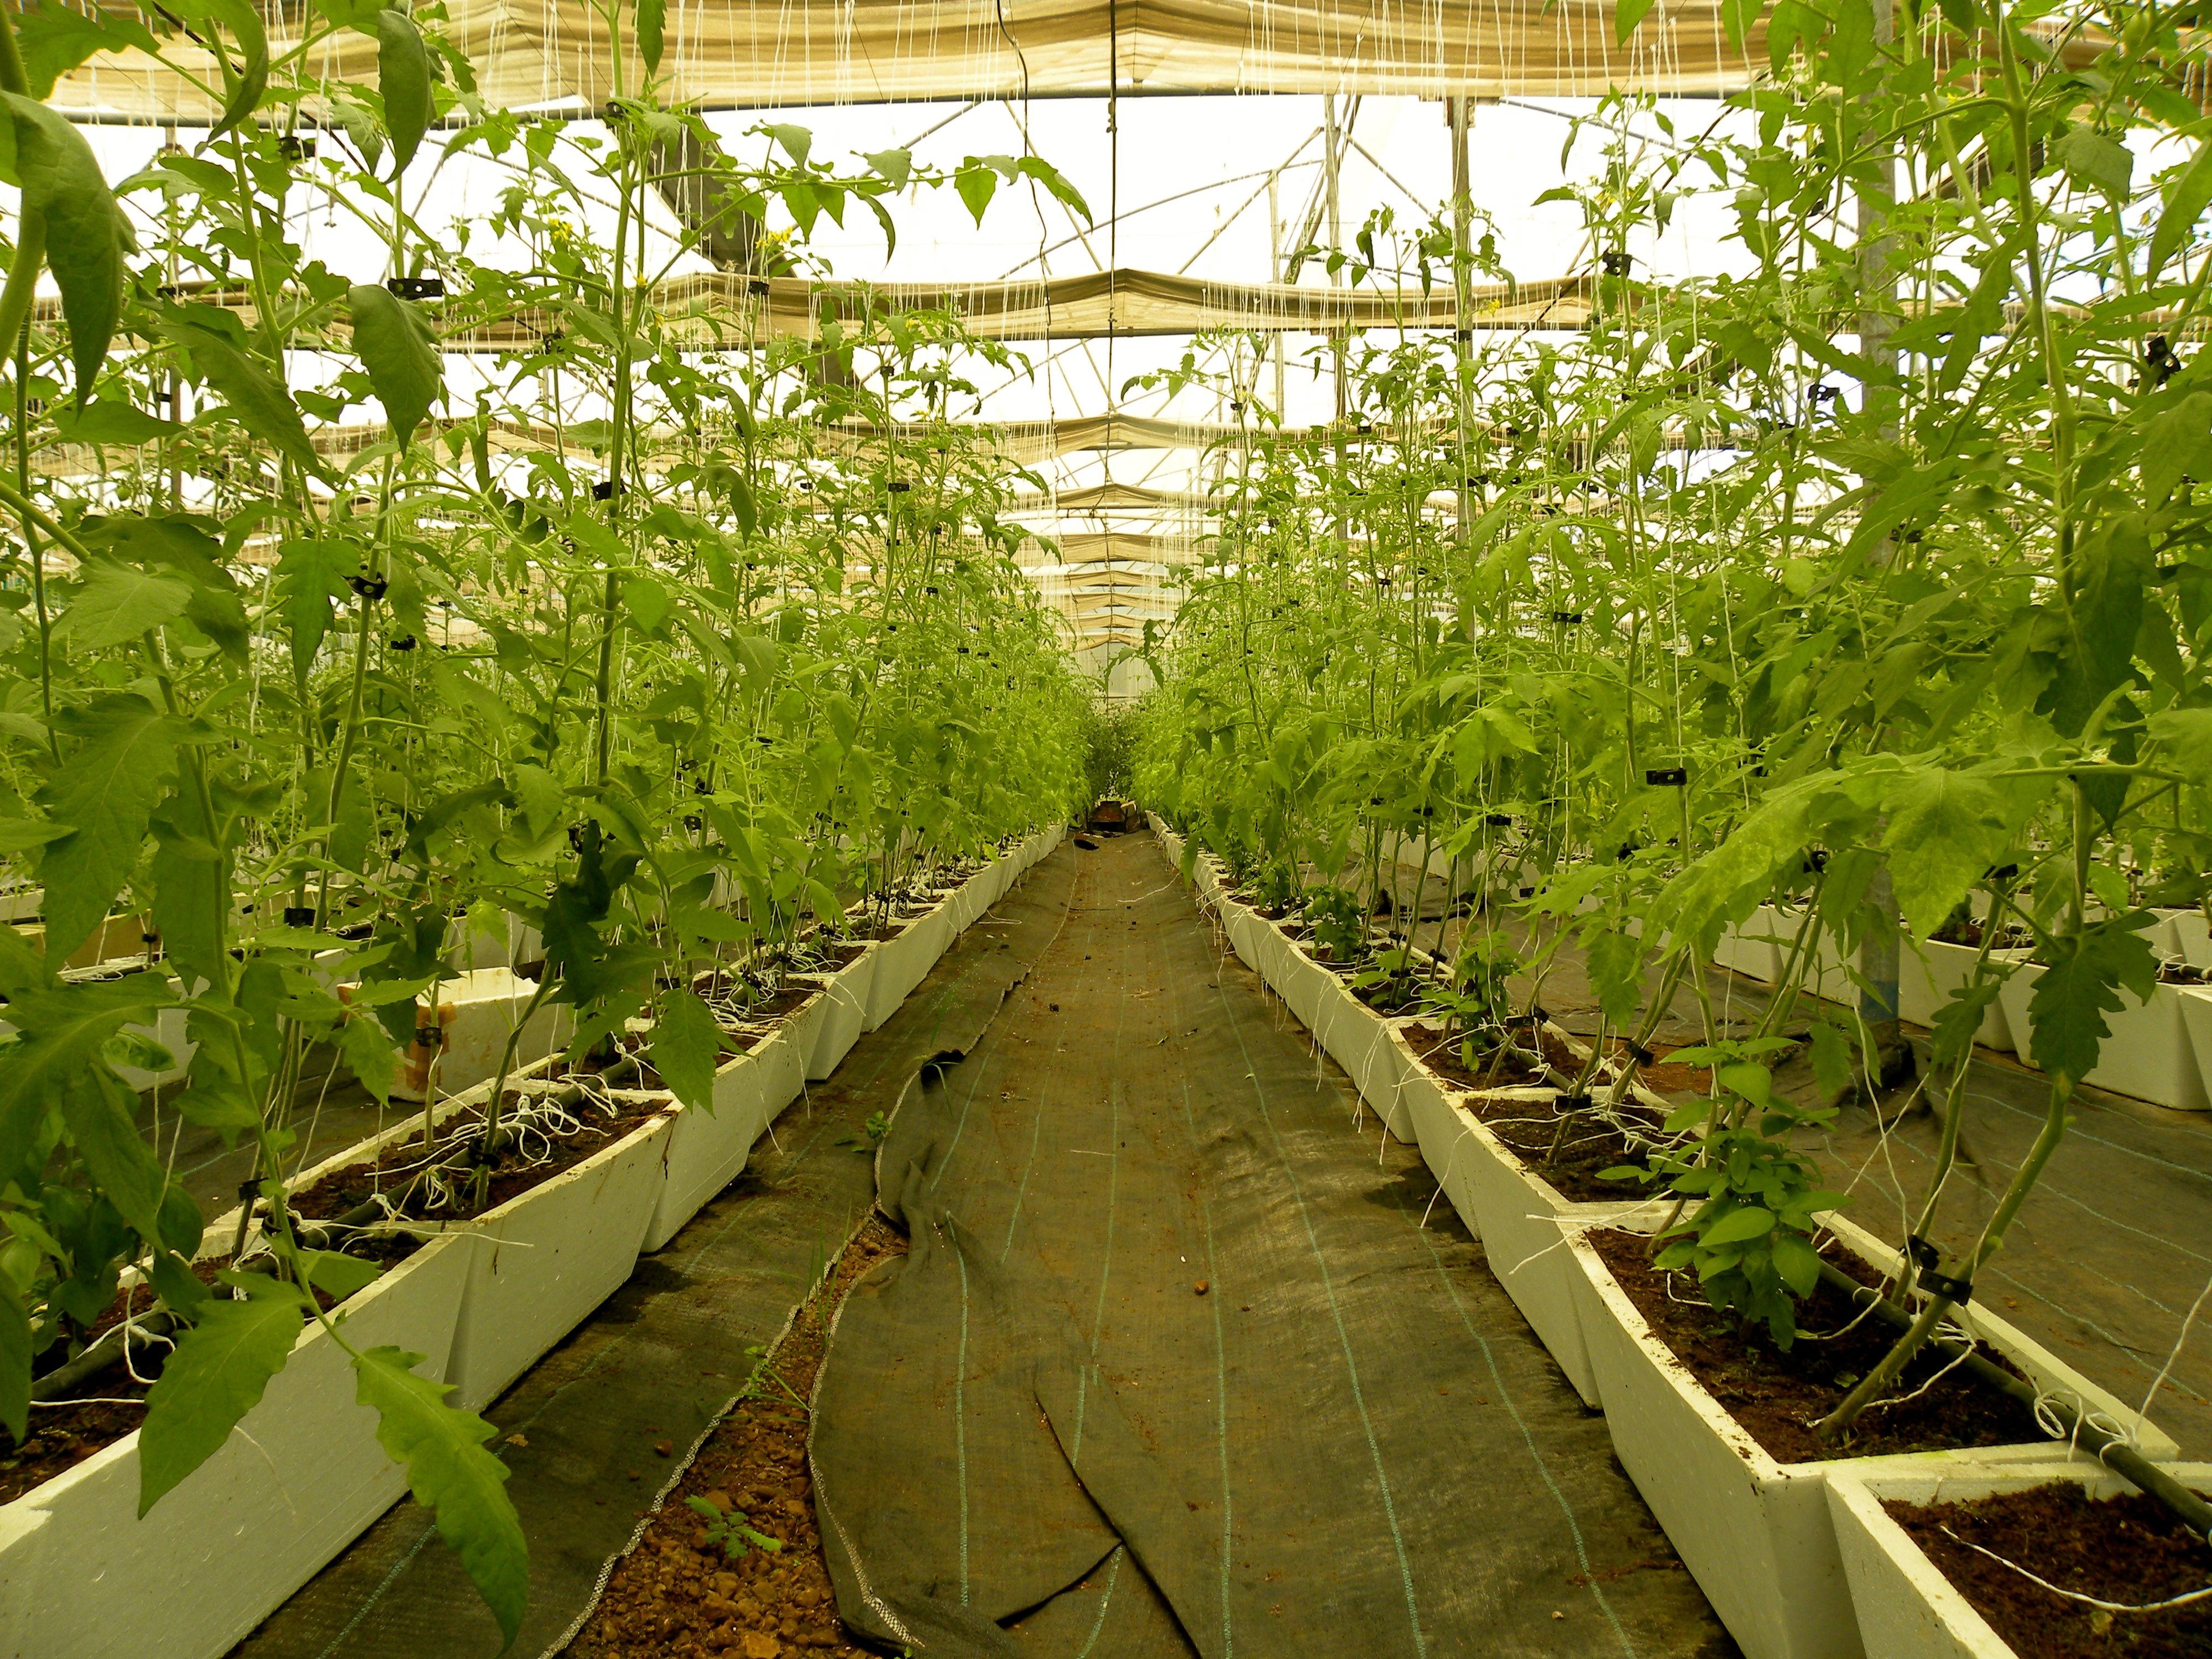 Triton Foodworks - Hydroponics Farming